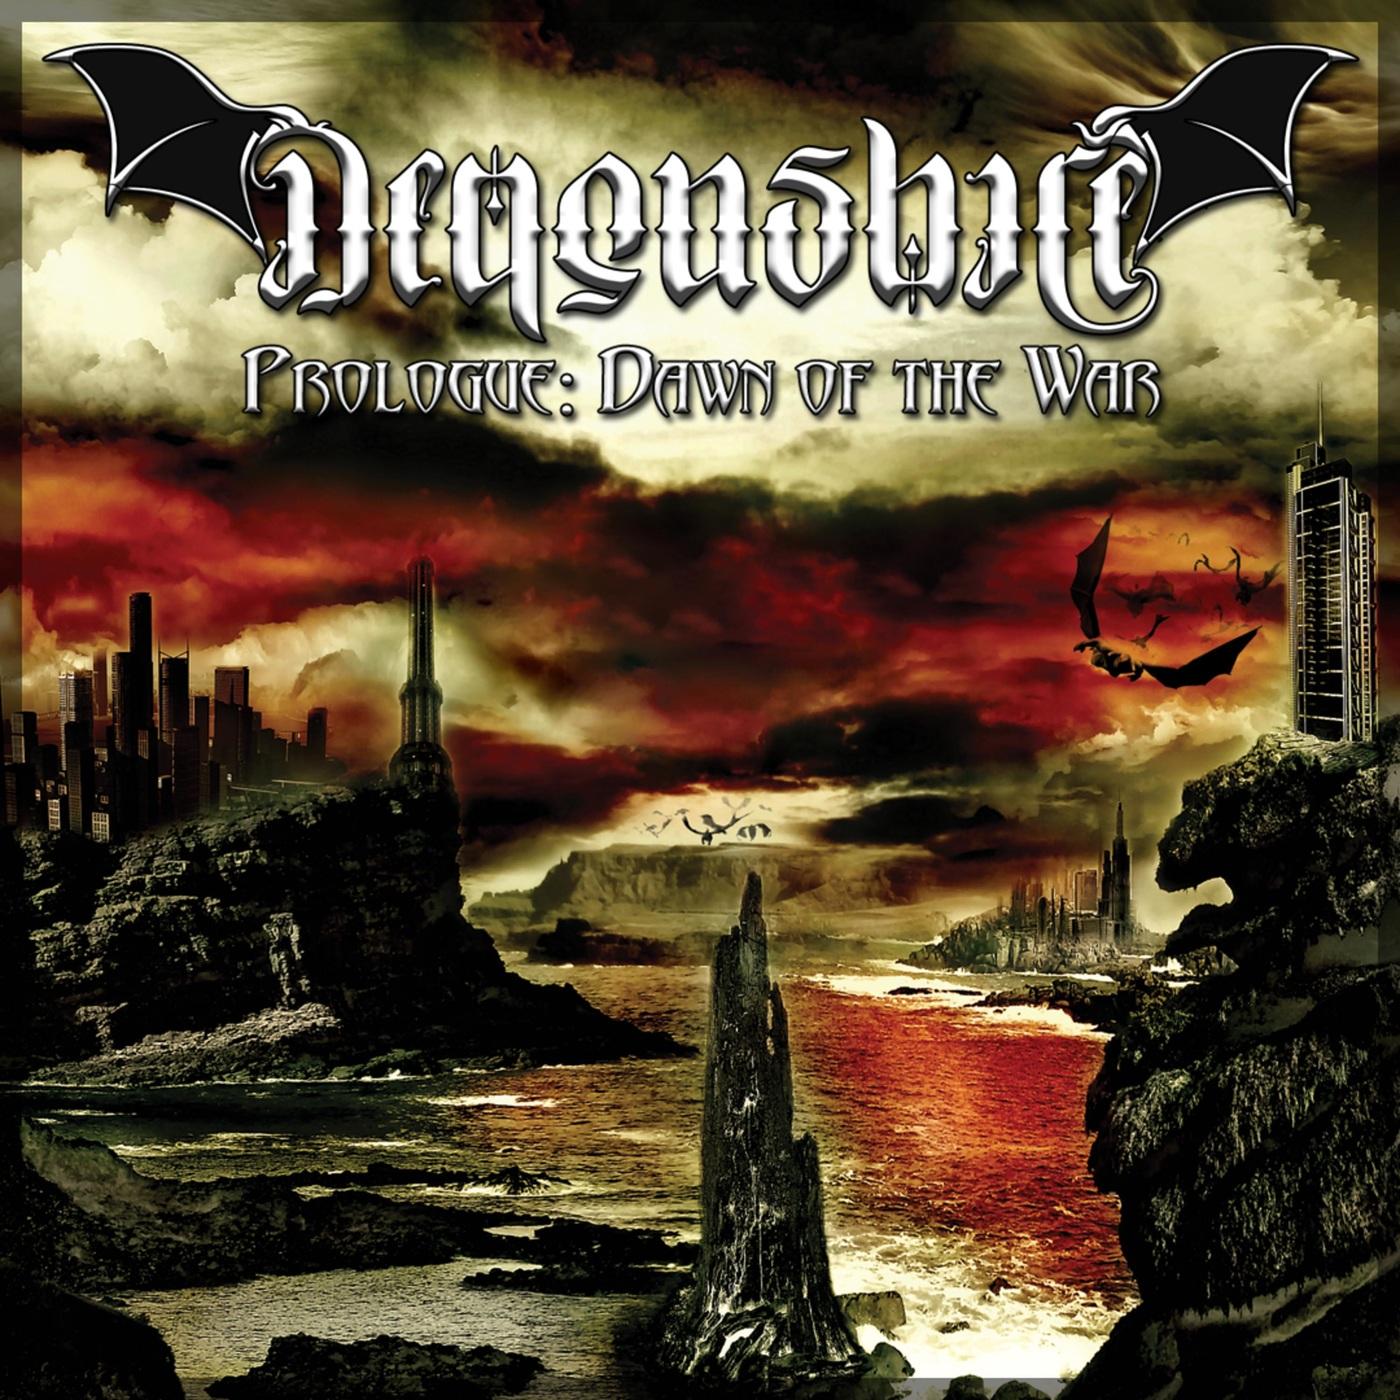 Demonshire - Prologue Dawn Of The War